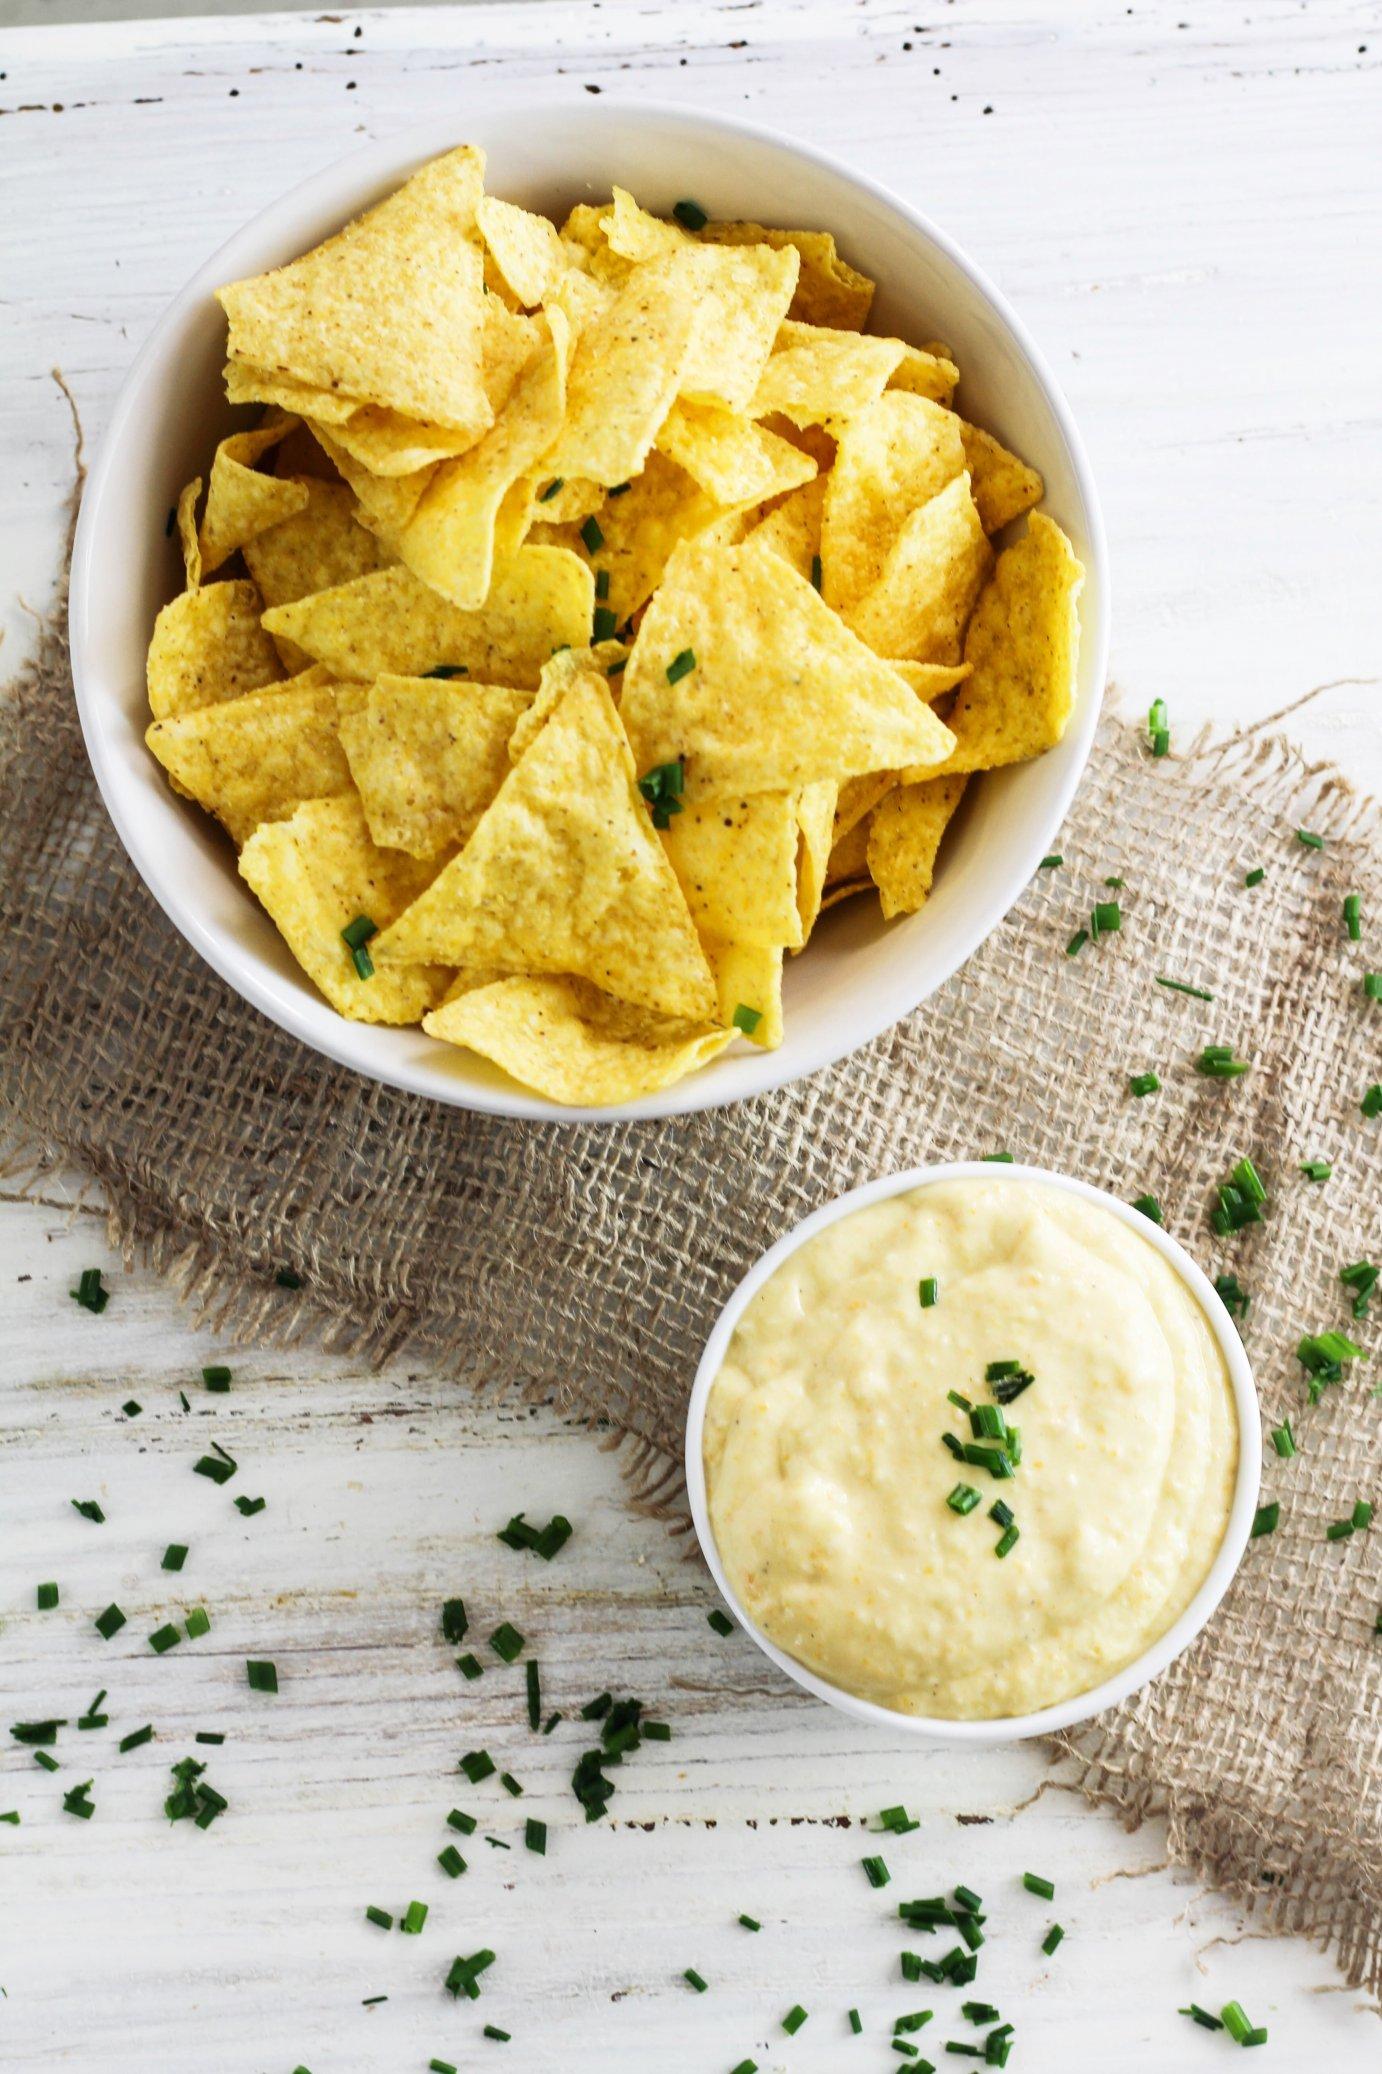 Vegane-kaesesosse-zum-ueberbacken-und-dippen